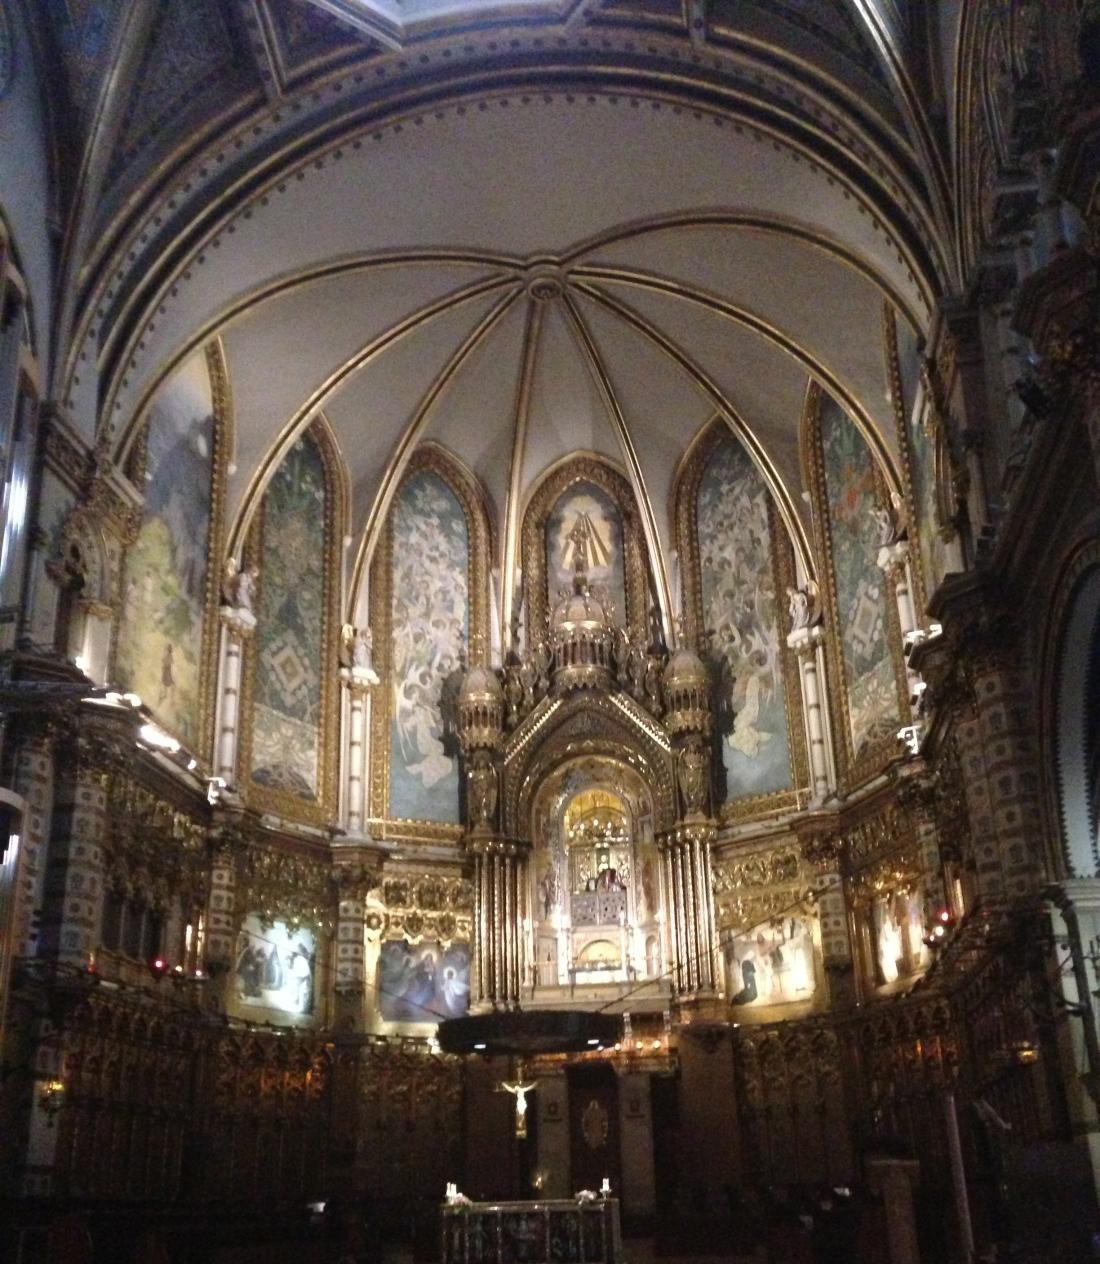 Virgin of Montserrat